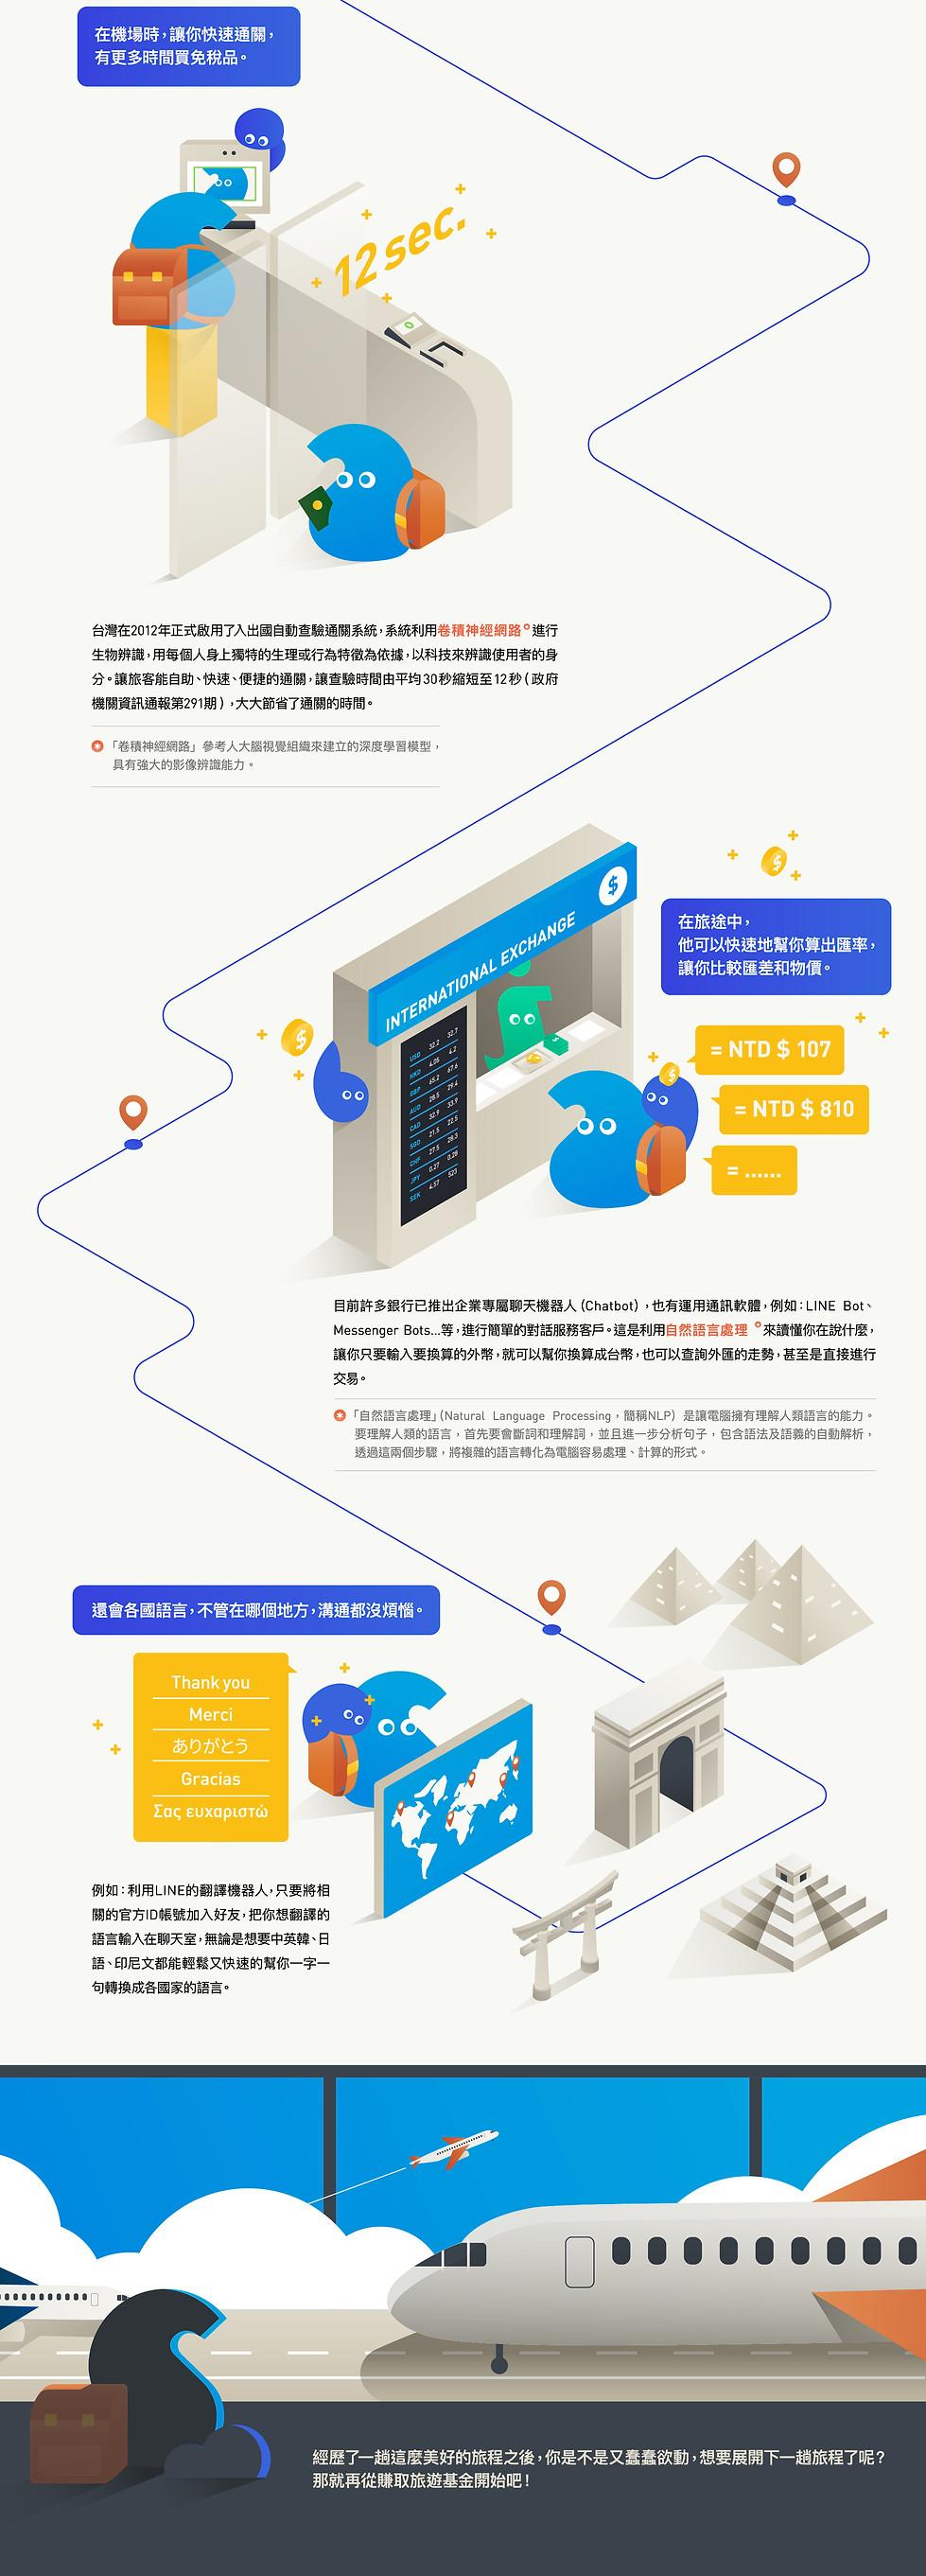 AI最好的旅伴_infographic_OL拆解-02.jpg